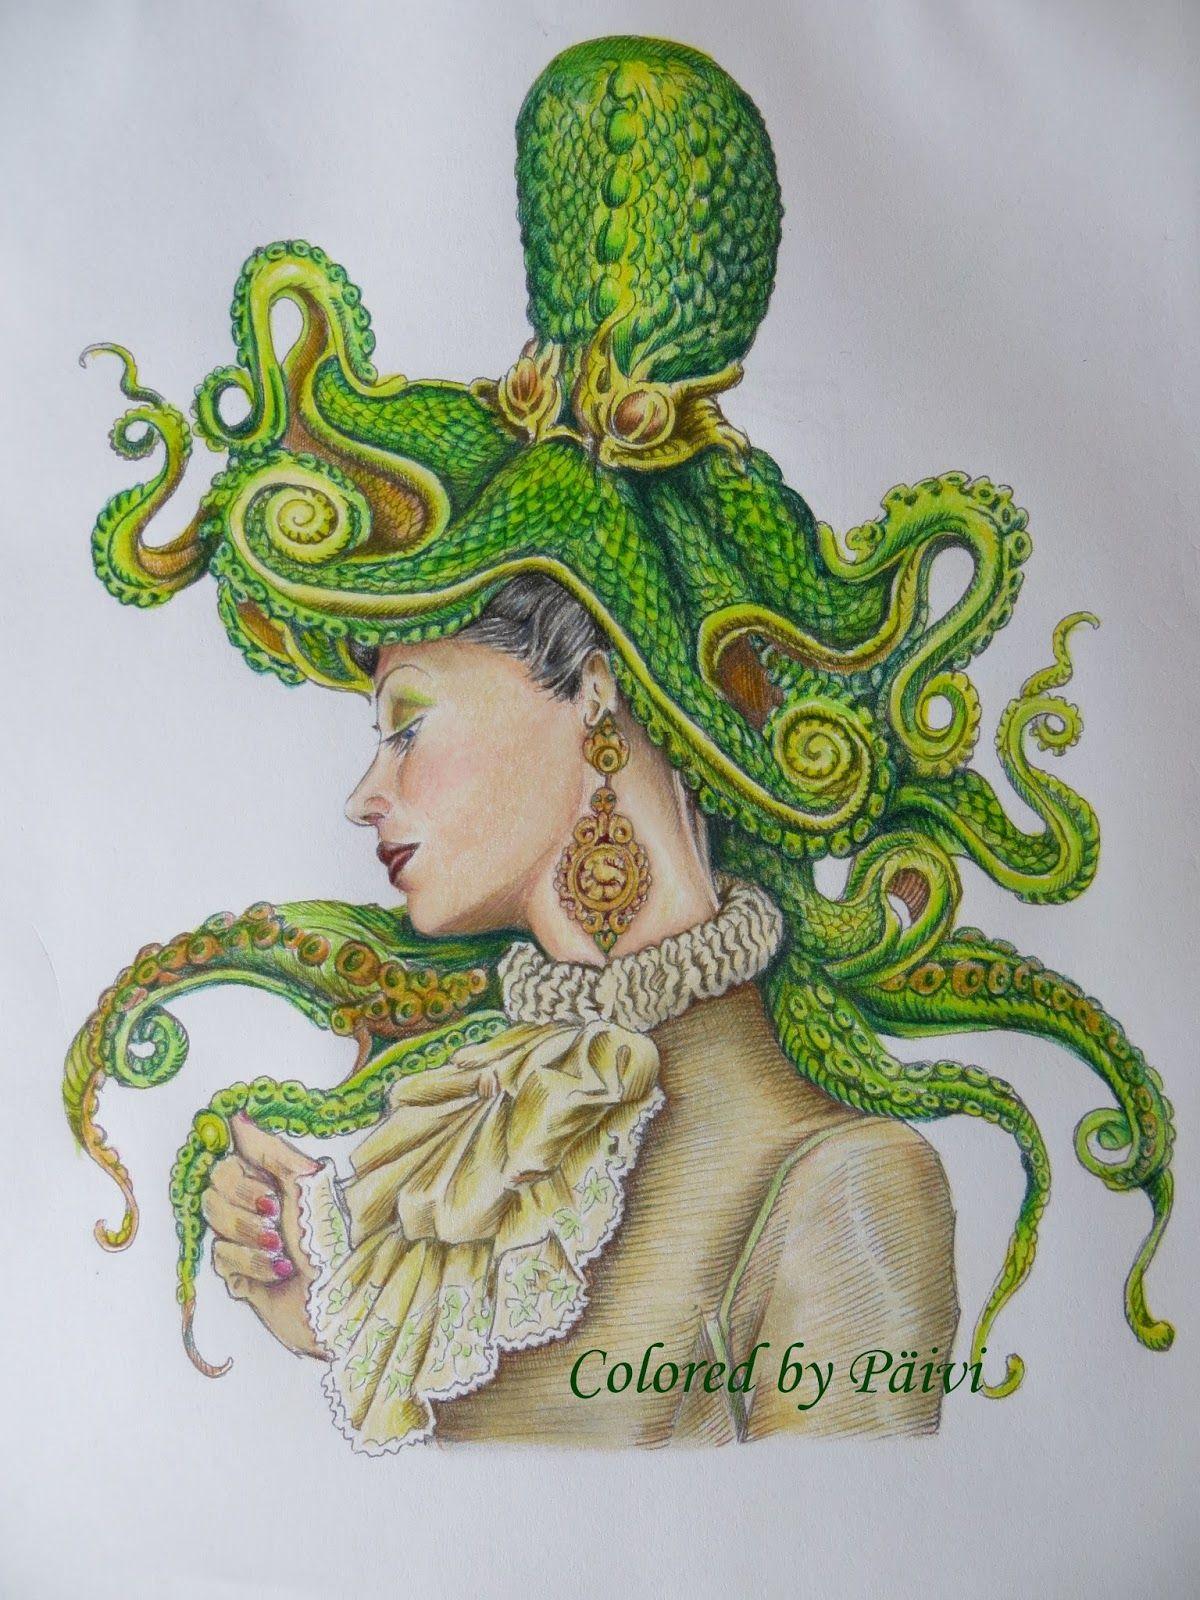 Cycloptopus Coloring Book Page, Adult Coloring, Cyclops Octopus ...